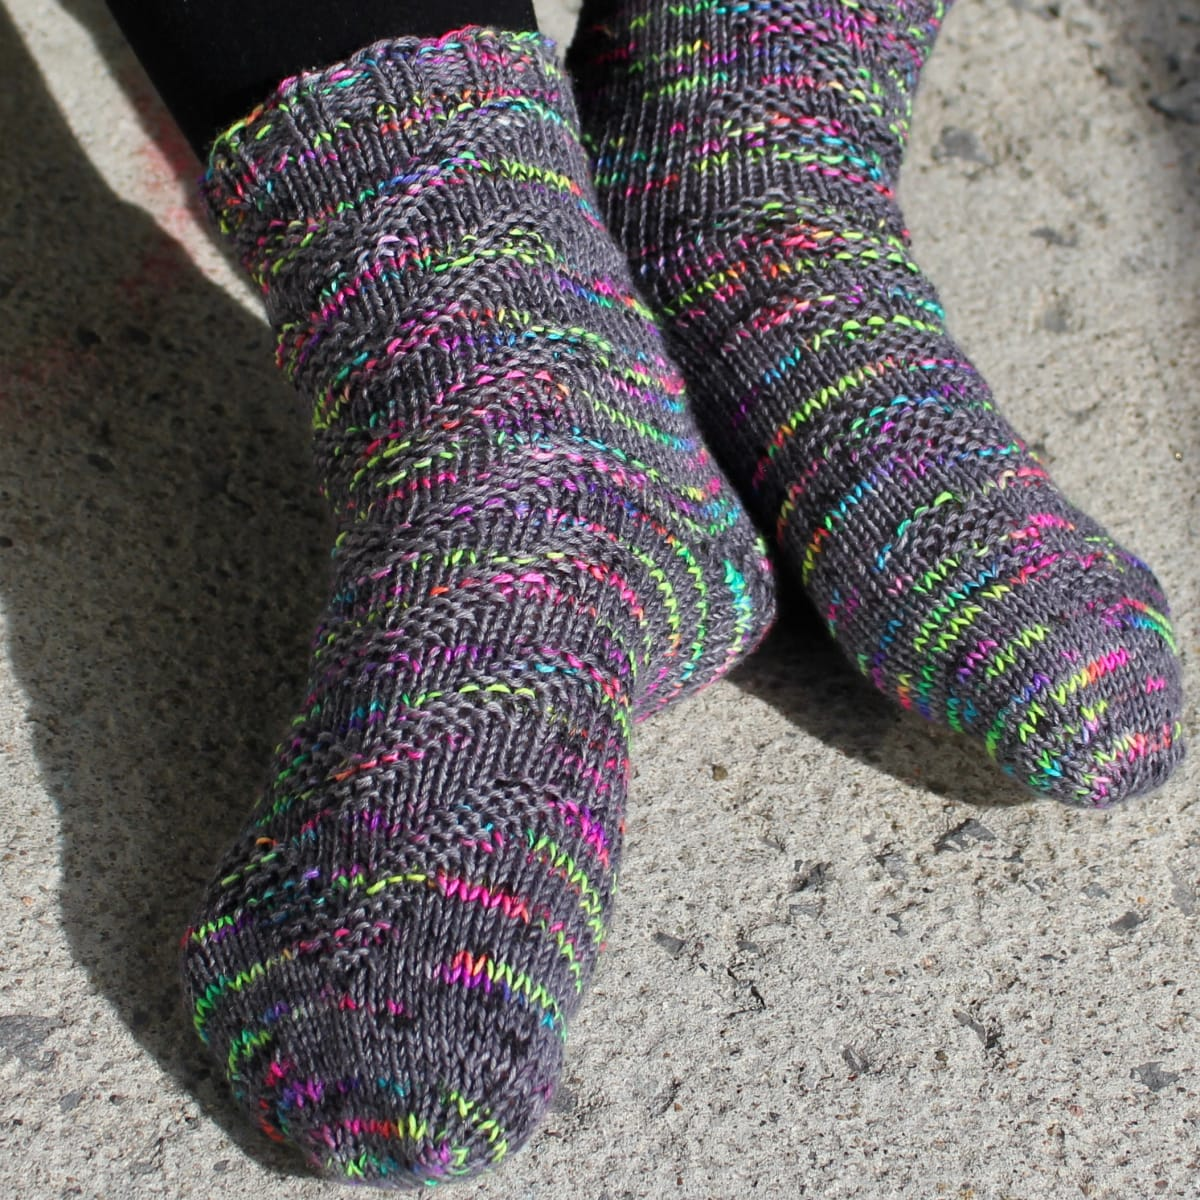 Feet wearing dark grey and rainbow socks with raised chevron texture.